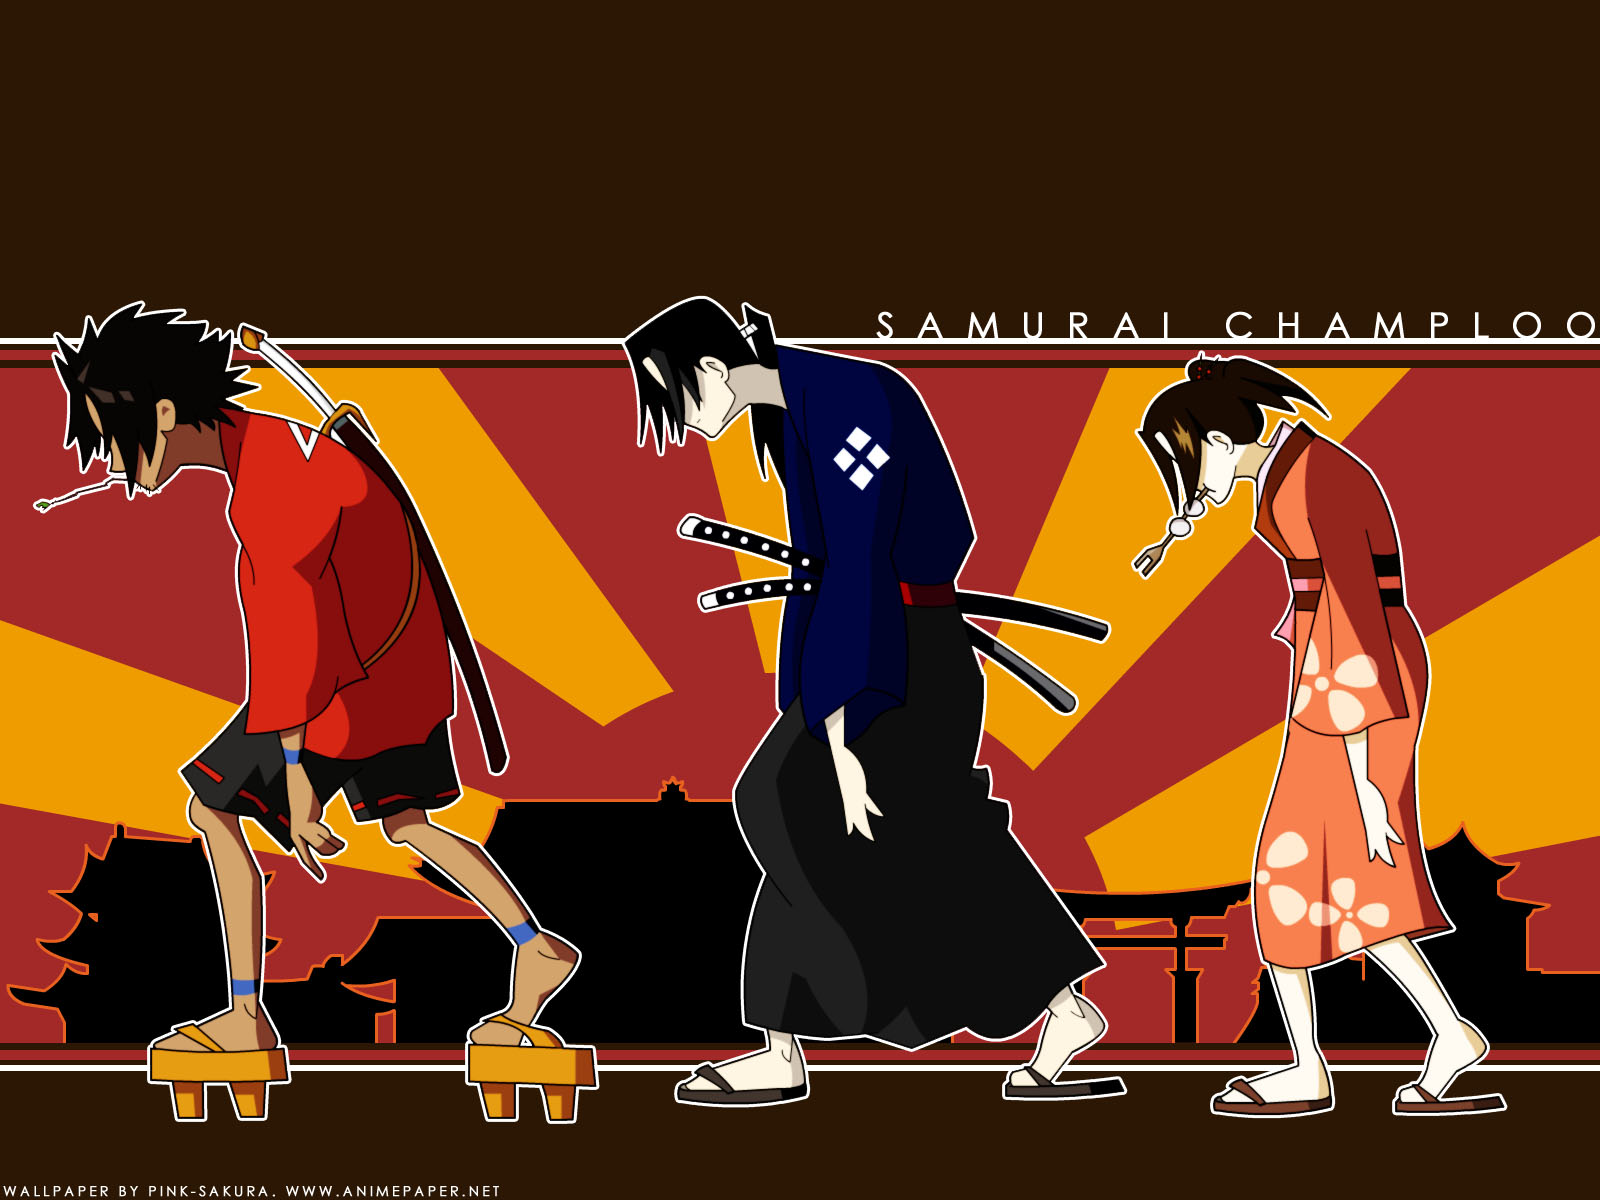 http://3.bp.blogspot.com/-uF8ToYo3mWA/TtqNGDHCJNI/AAAAAAAAAOI/Vcs_T7GG6NY/s1600/samurai_champloo_paper_pink_sakura_anime_desktop_1600x1200_wallpaper-126392.jpeg